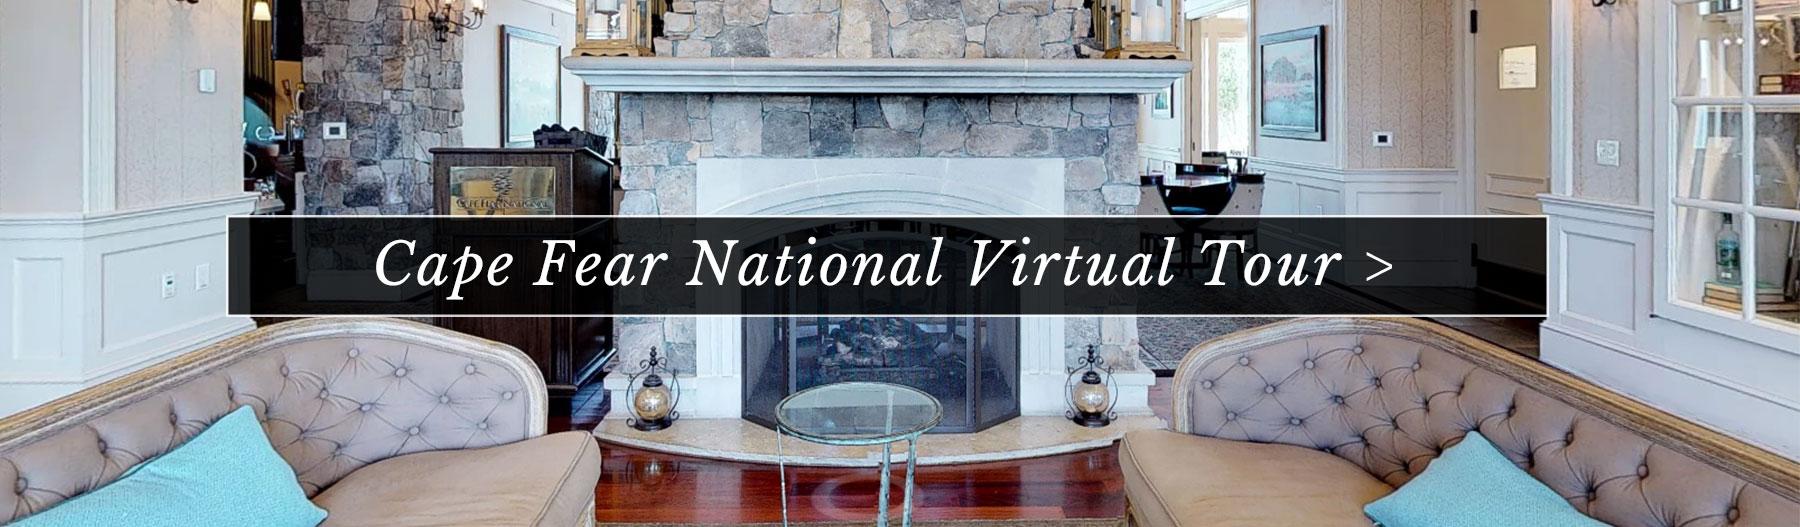 Cape Fear National Virtual Tour